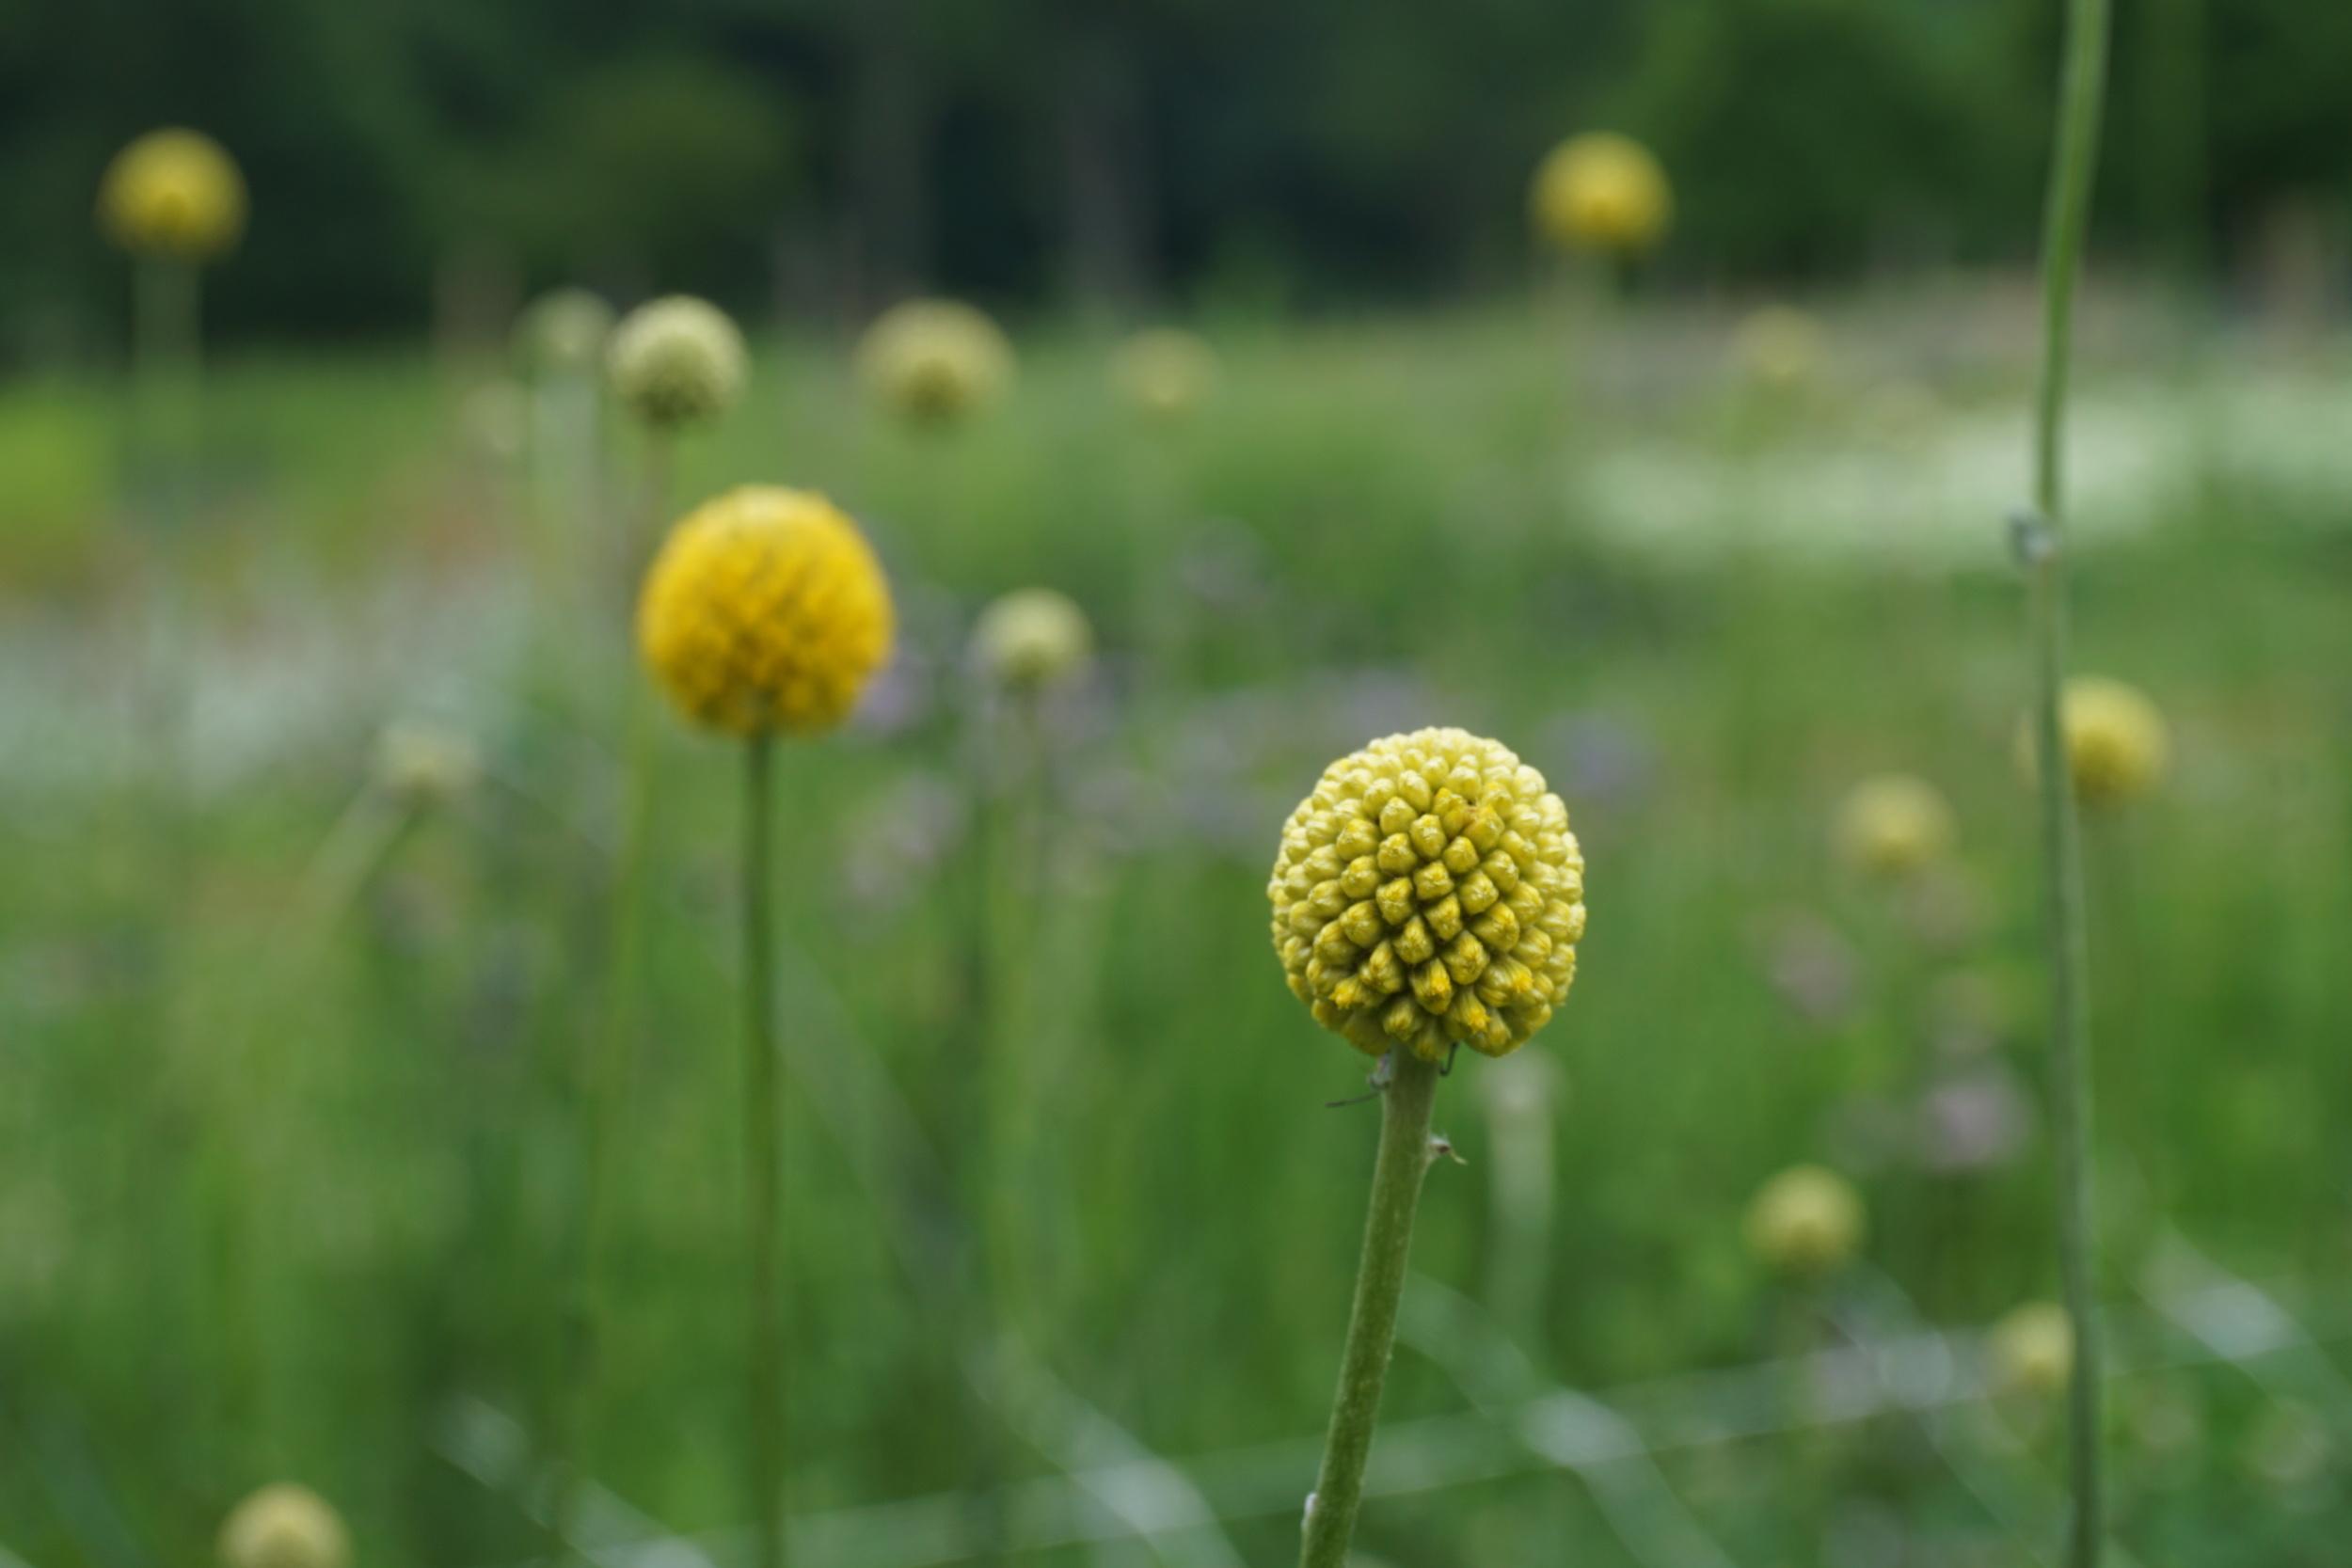 craspedia, or drumstick flower